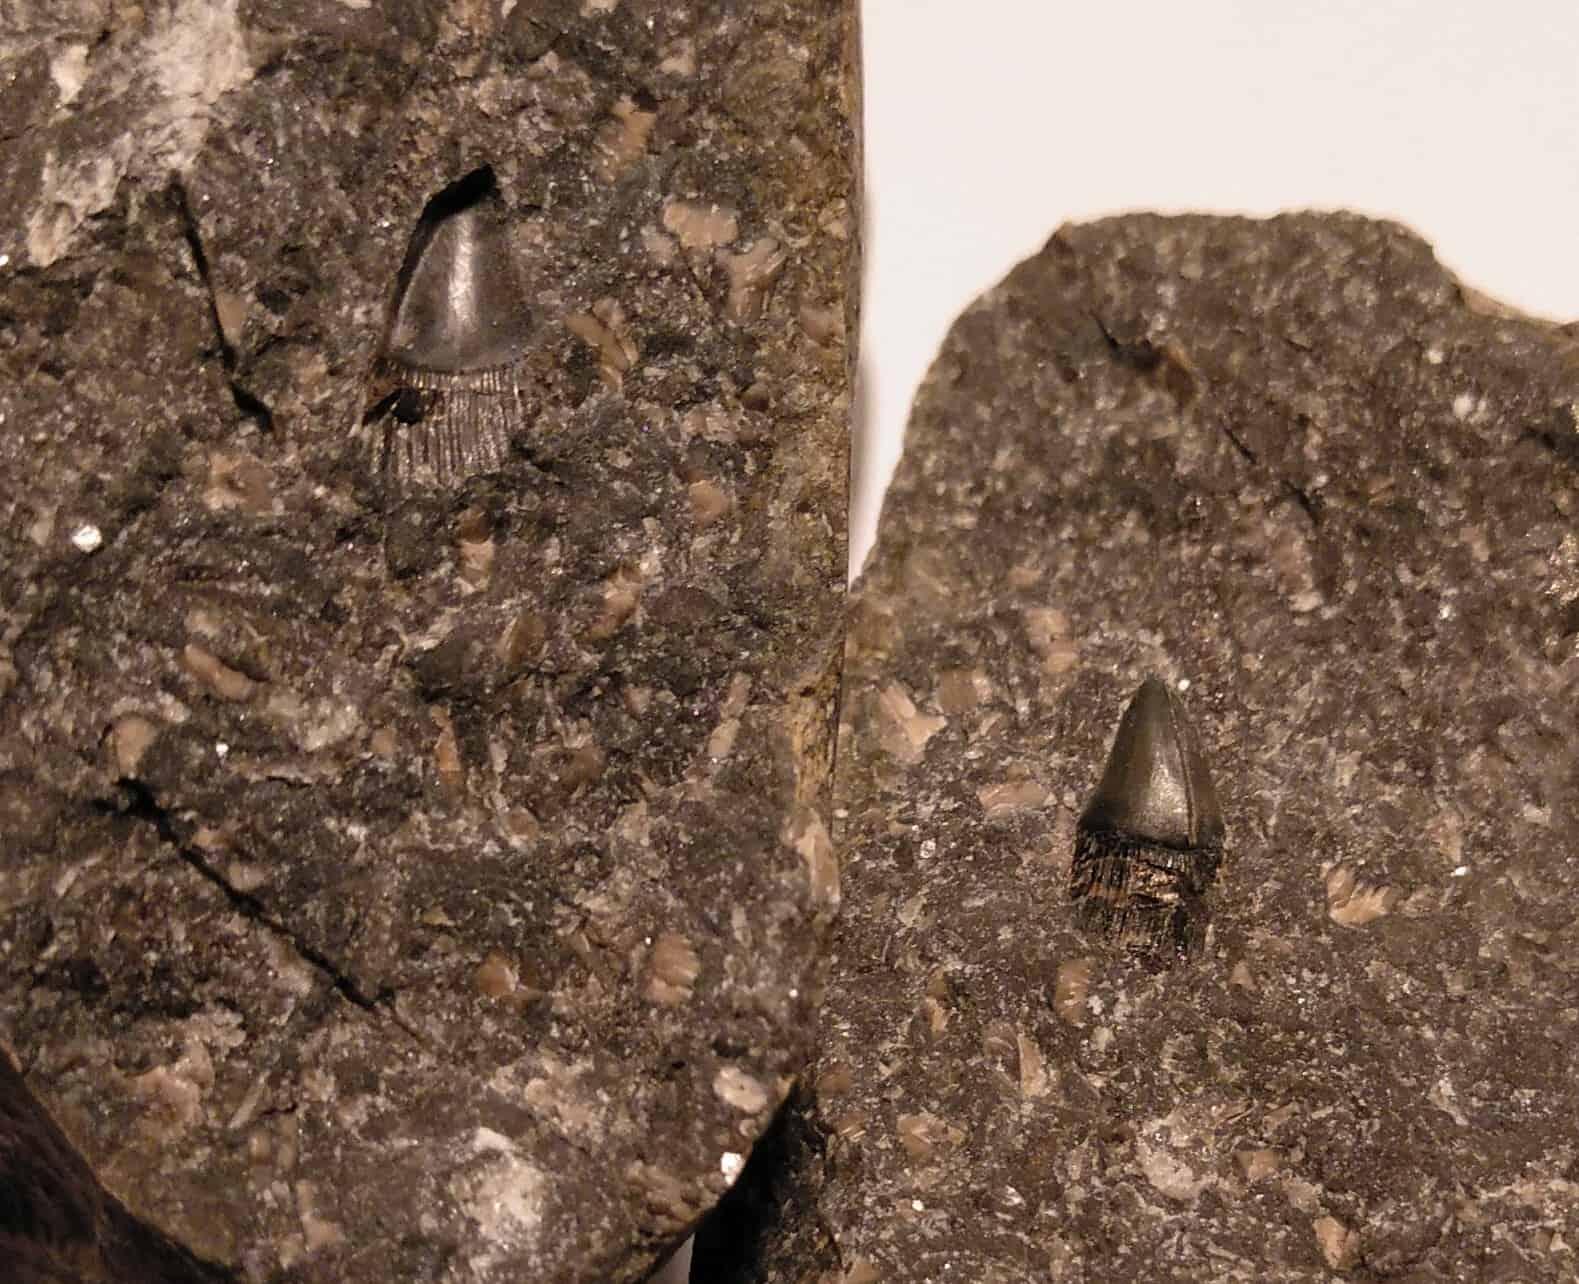 Saurichthys tooth